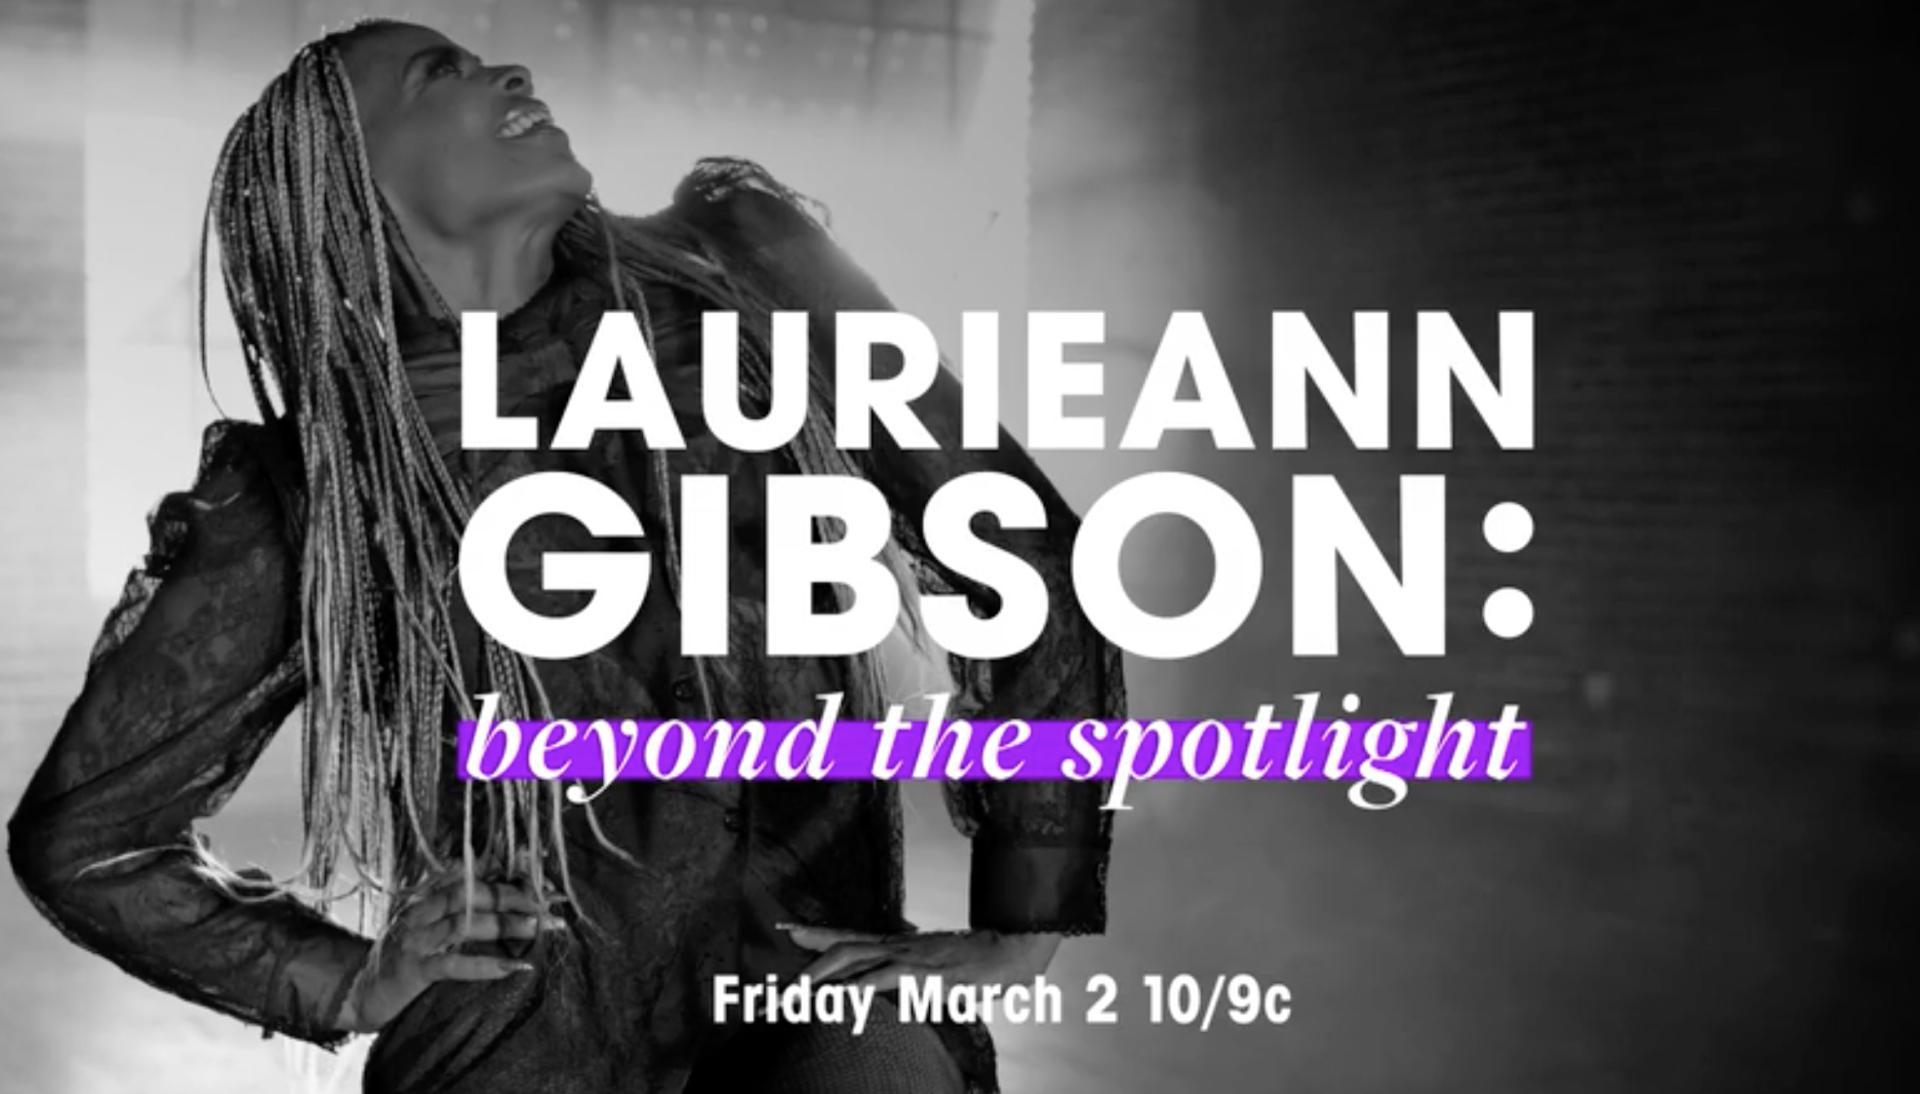 Laurieann Gibson in Laurieann Gibson: Beyond the Spotlight (2018)